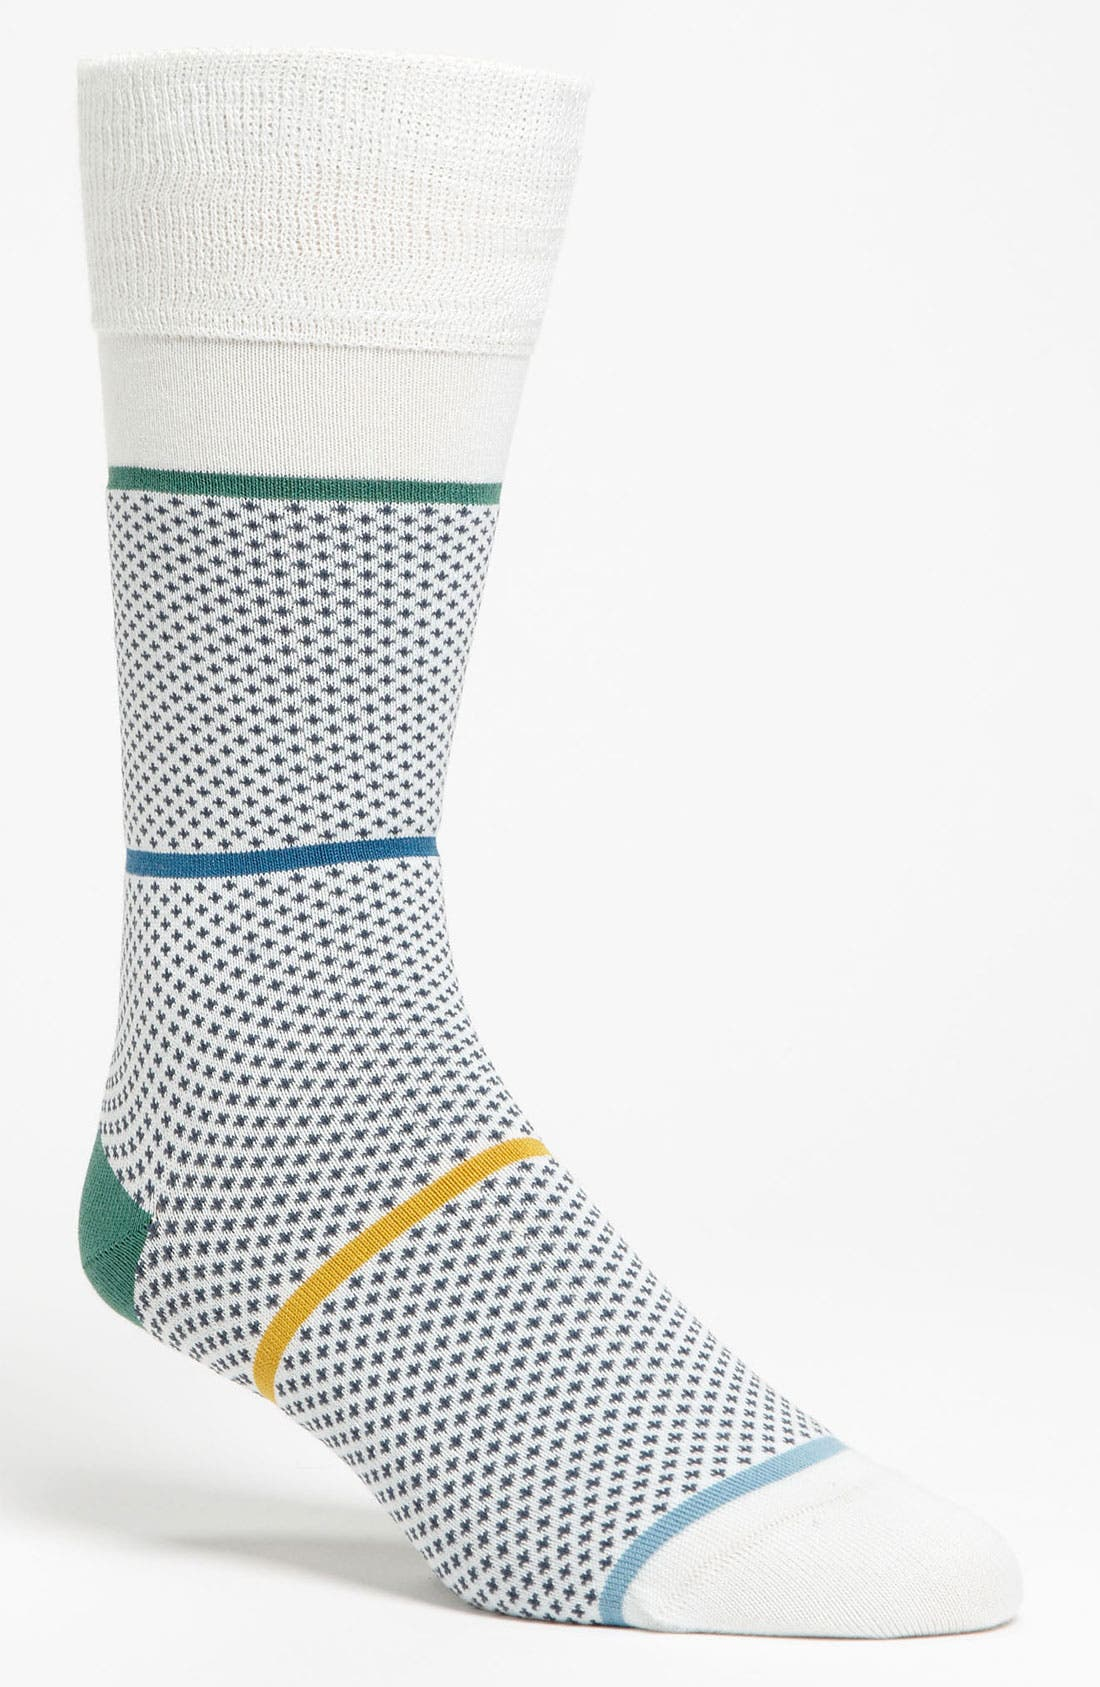 Main Image - Paul Smith Accessories Star Socks